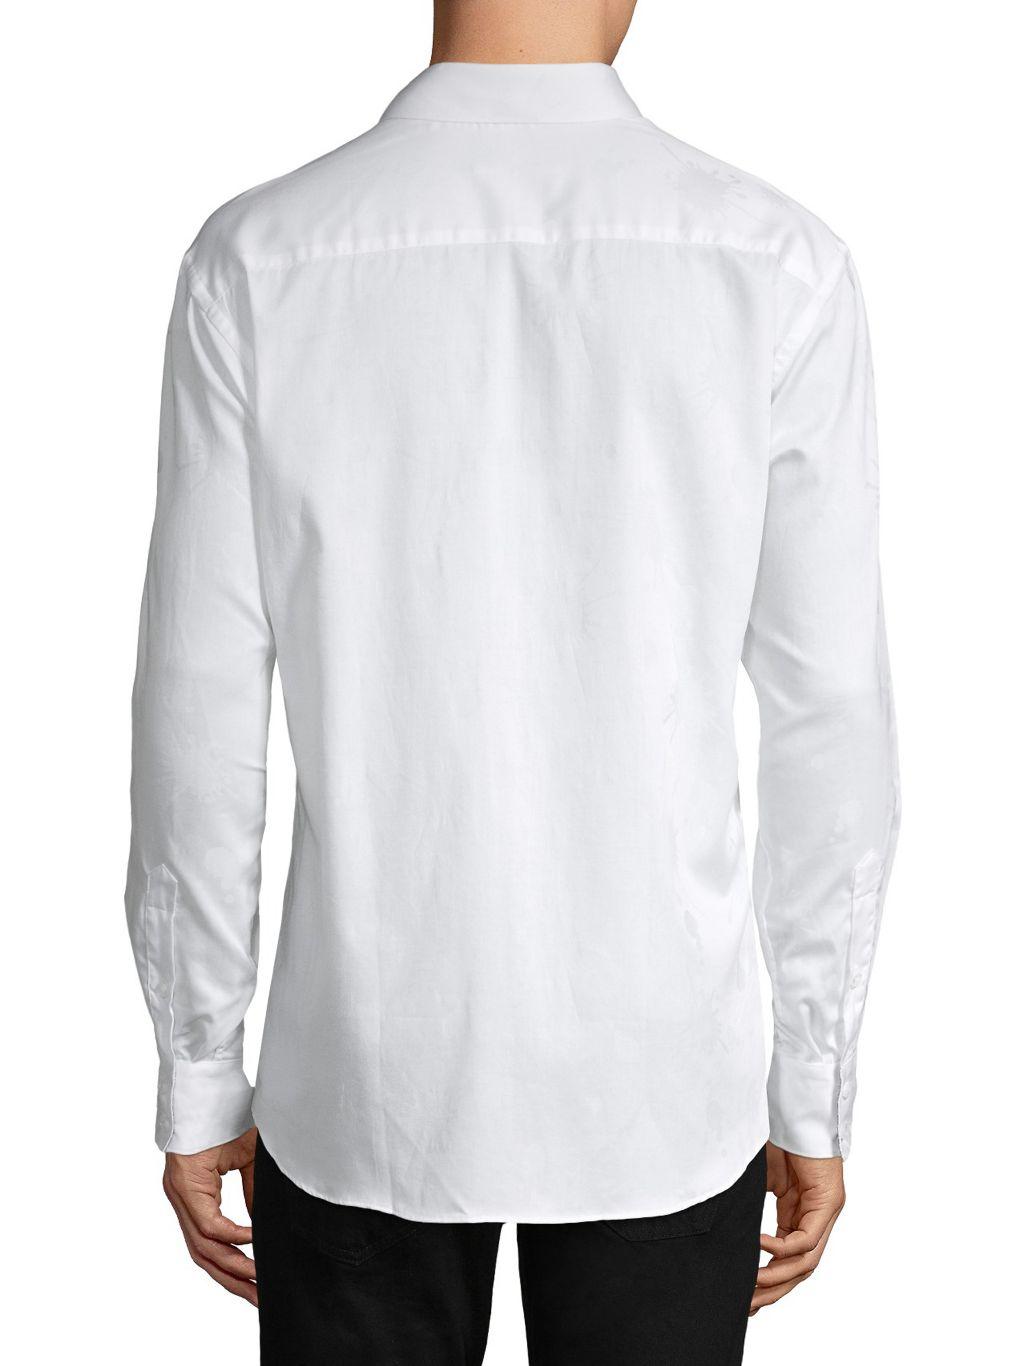 Bertigo Darvin Tonal-Patterned Shirt